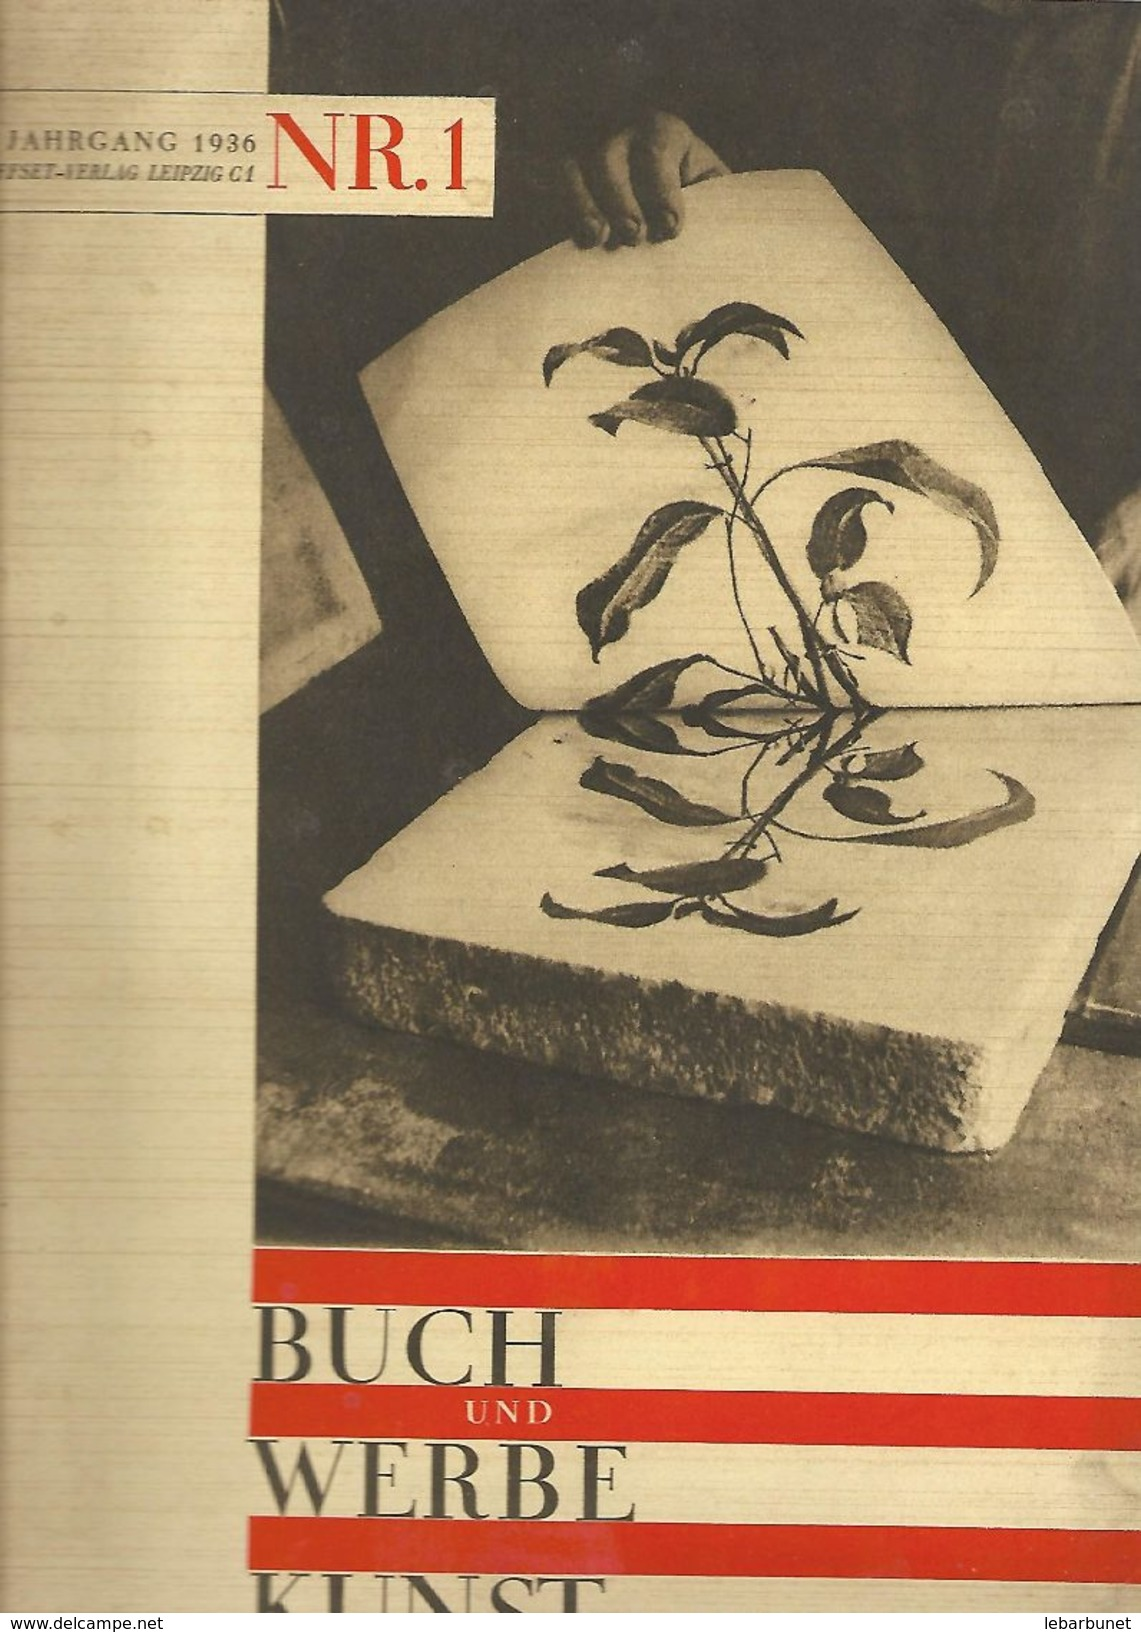 Buch Und Werbe Kunst  Jahrgang 1936 NR.1 - Catalogues